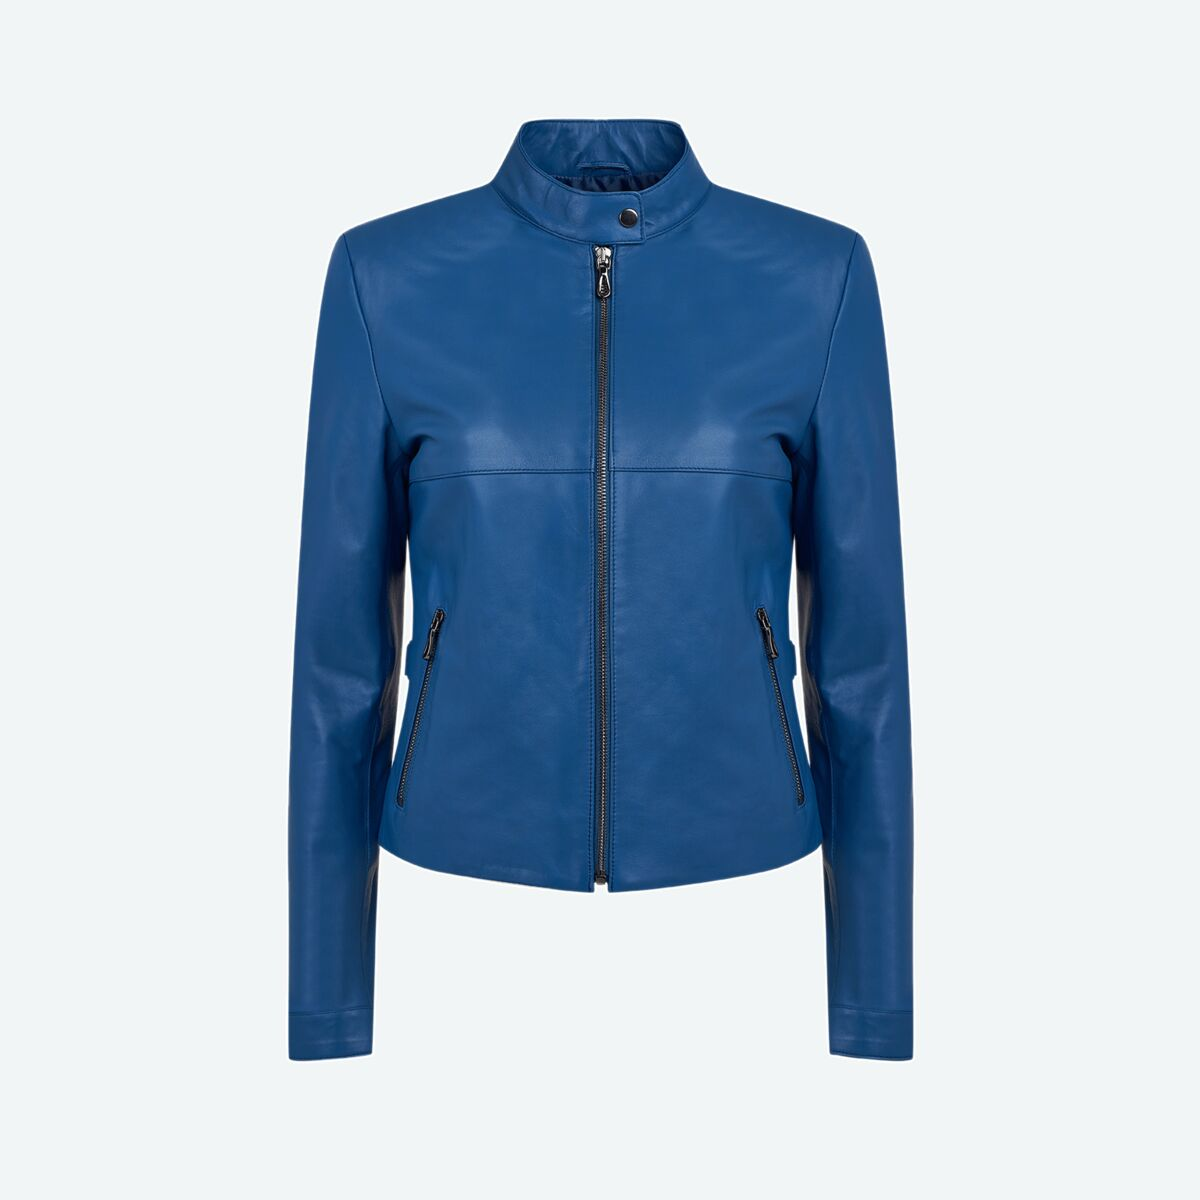 Women's Petite Leather Jacket - Blue